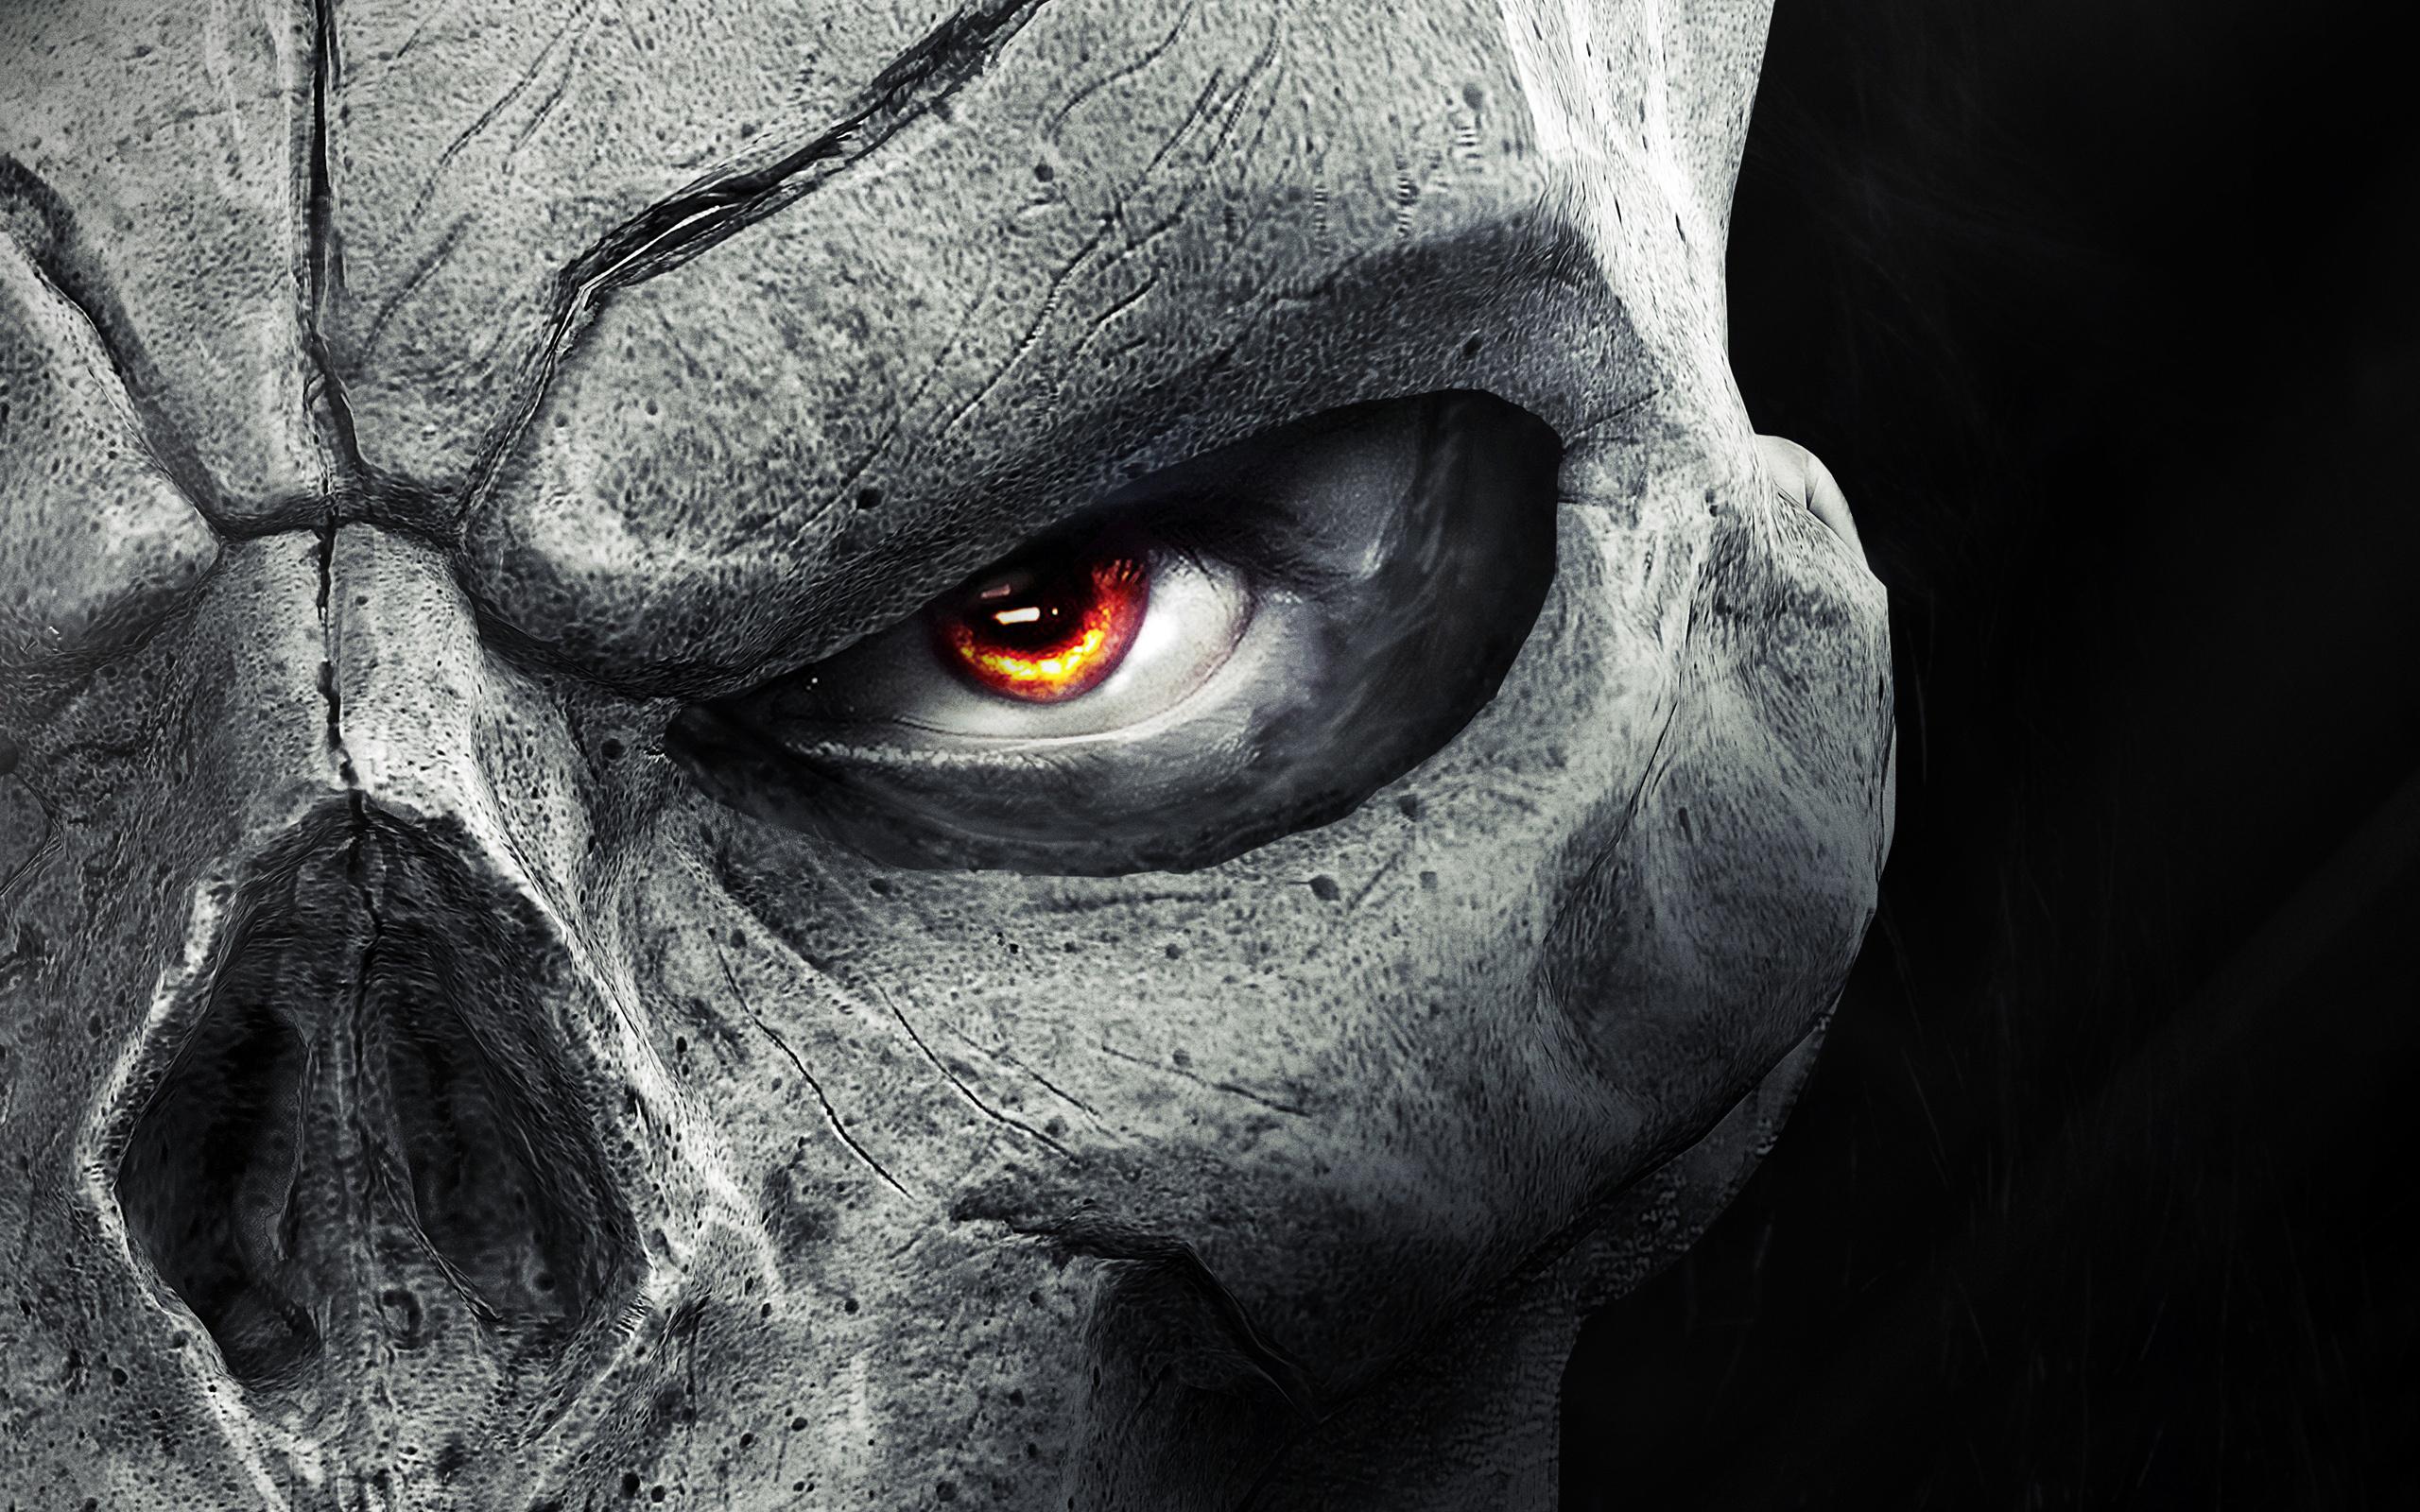 Darksiders 2 Video Game Wallpapers HD Wallpapers 2560x1600